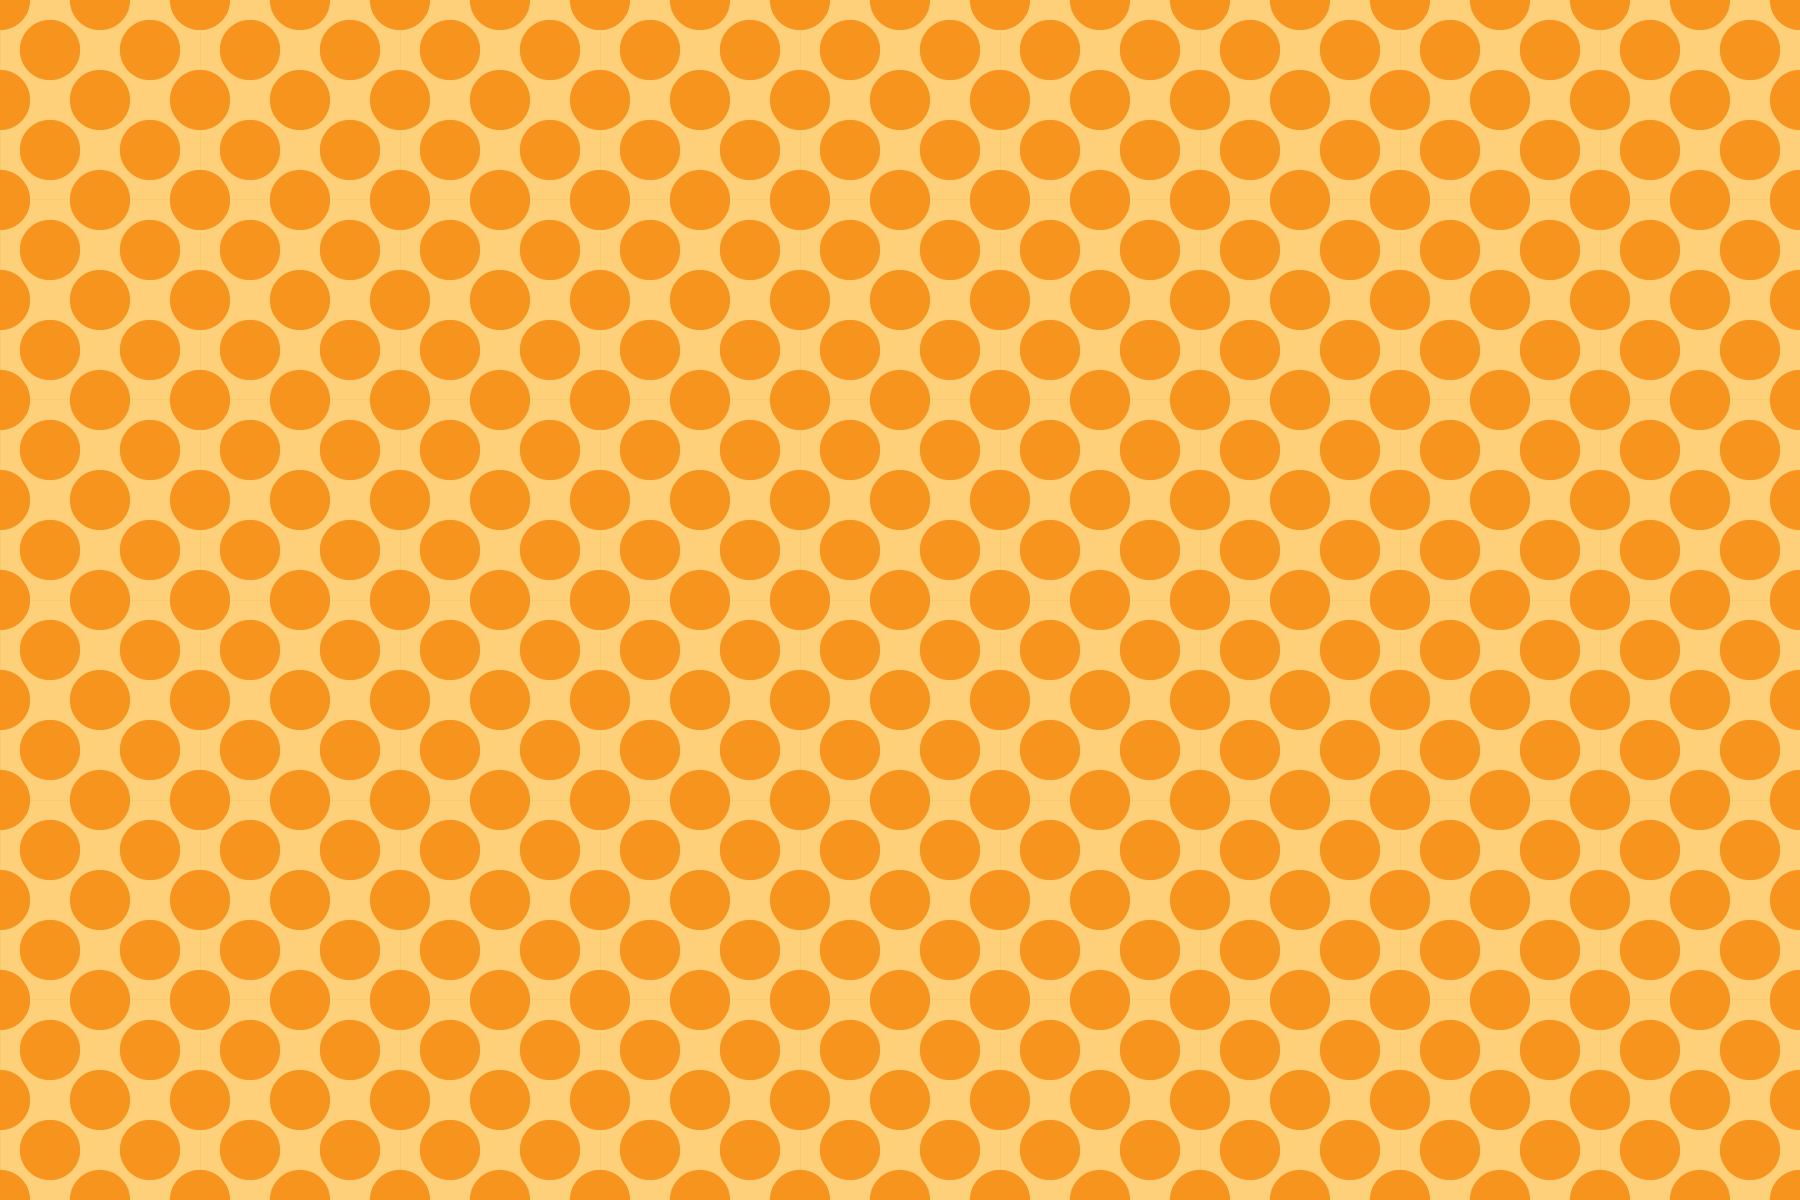 Small Polka Dot-01.jpg